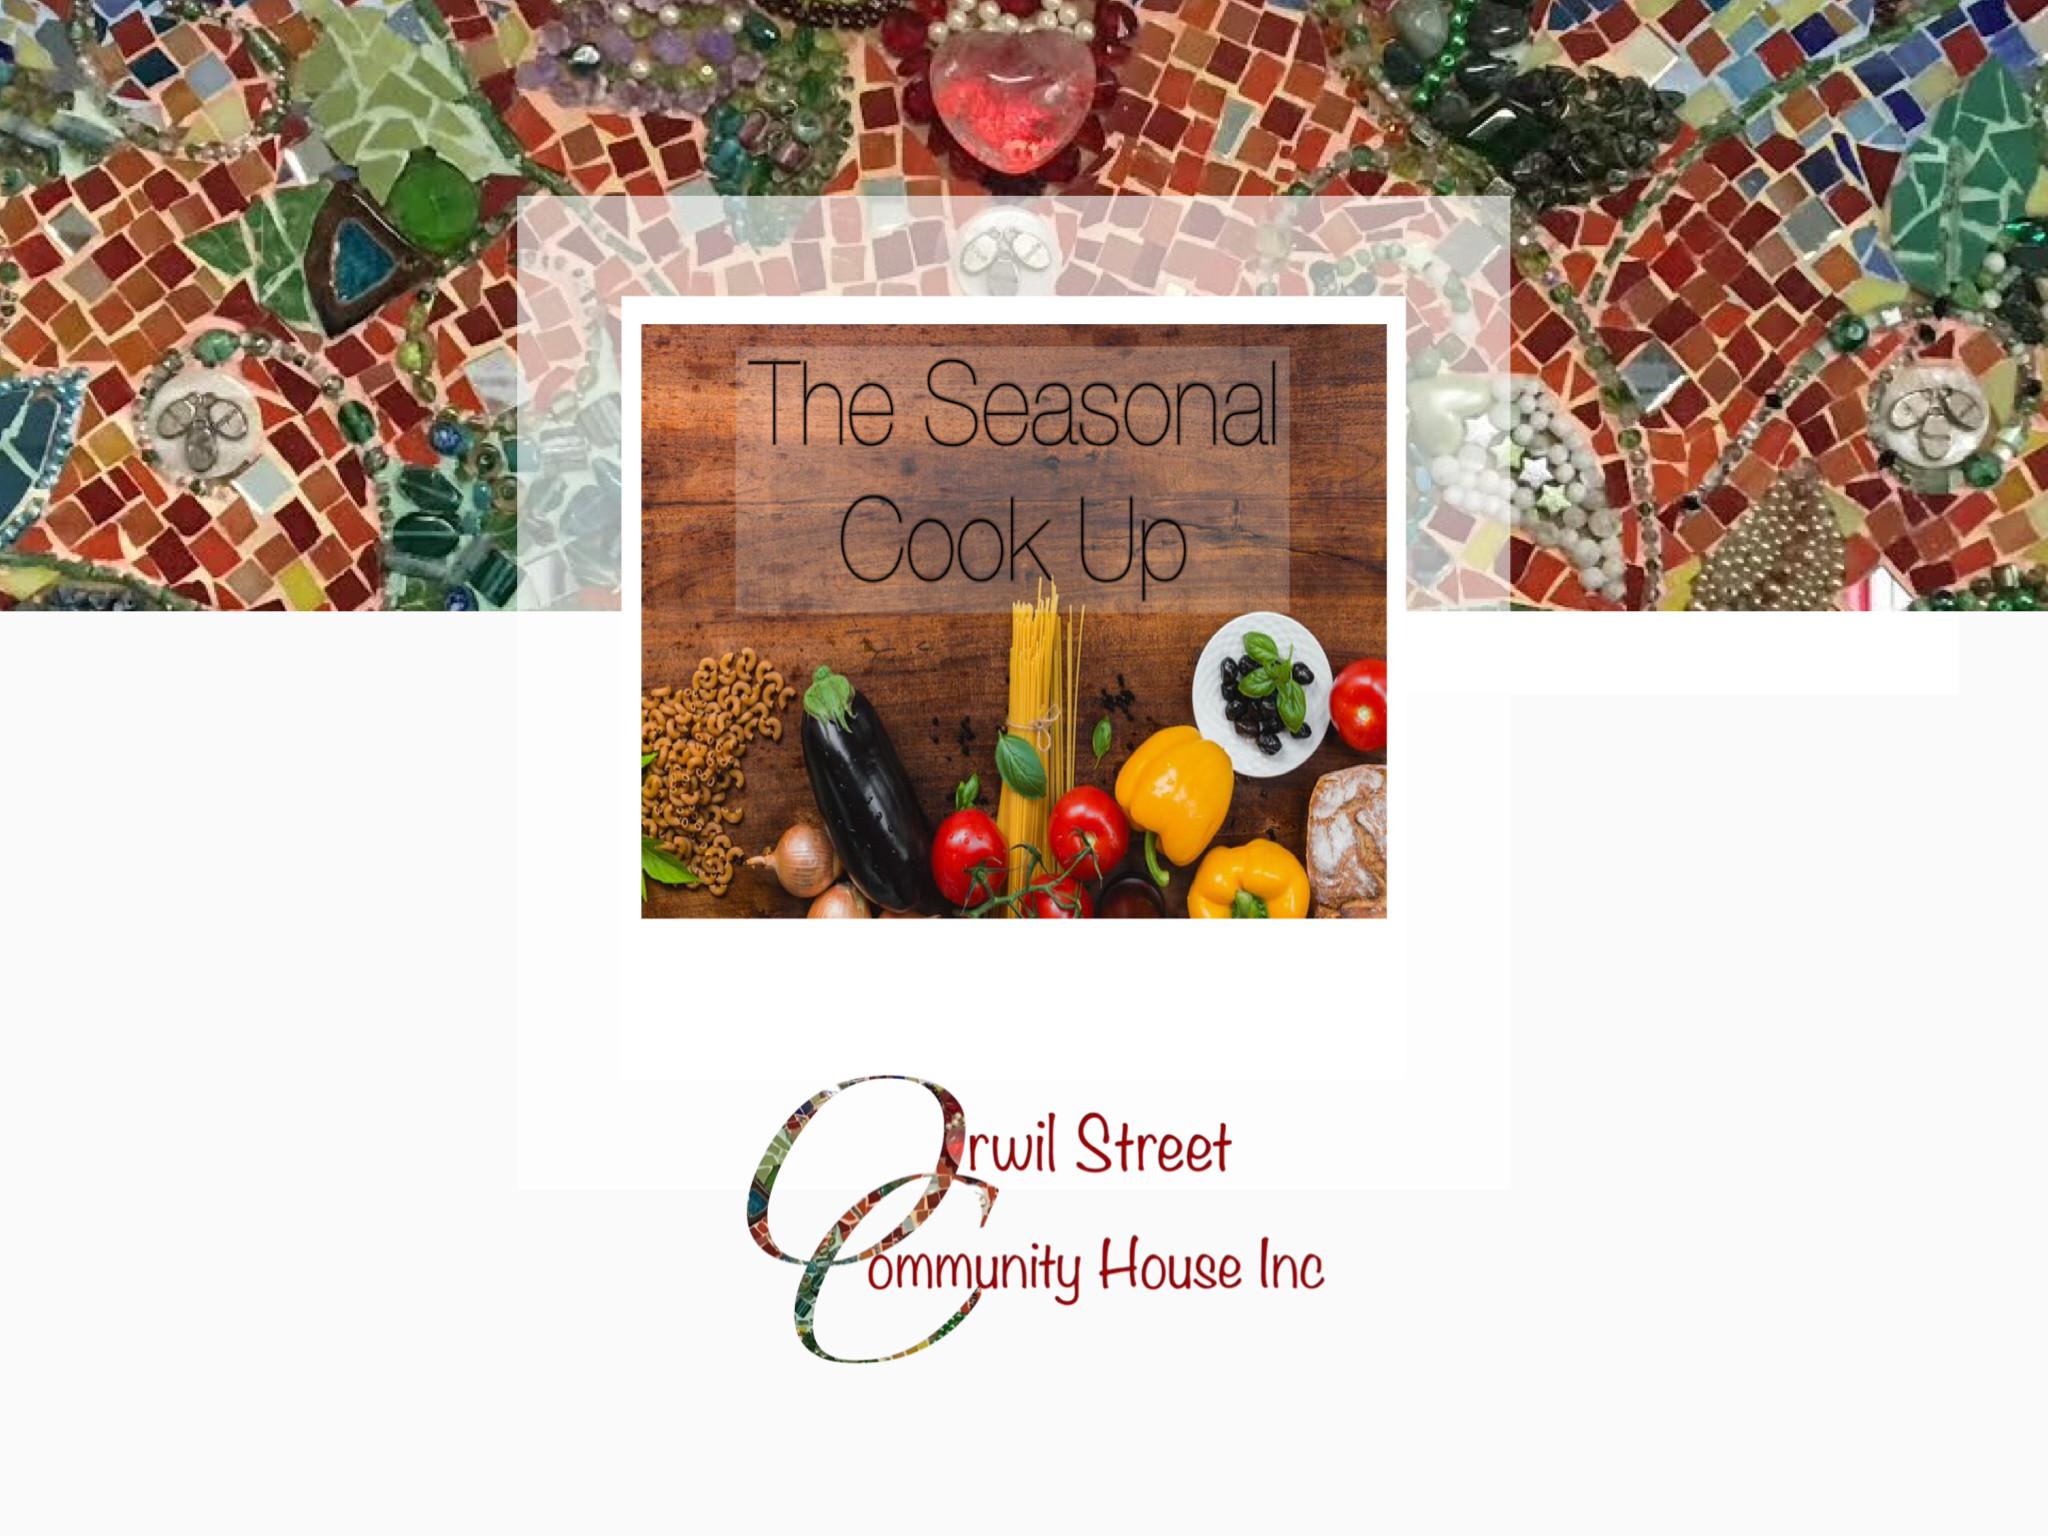 The Seasonal Cook Up